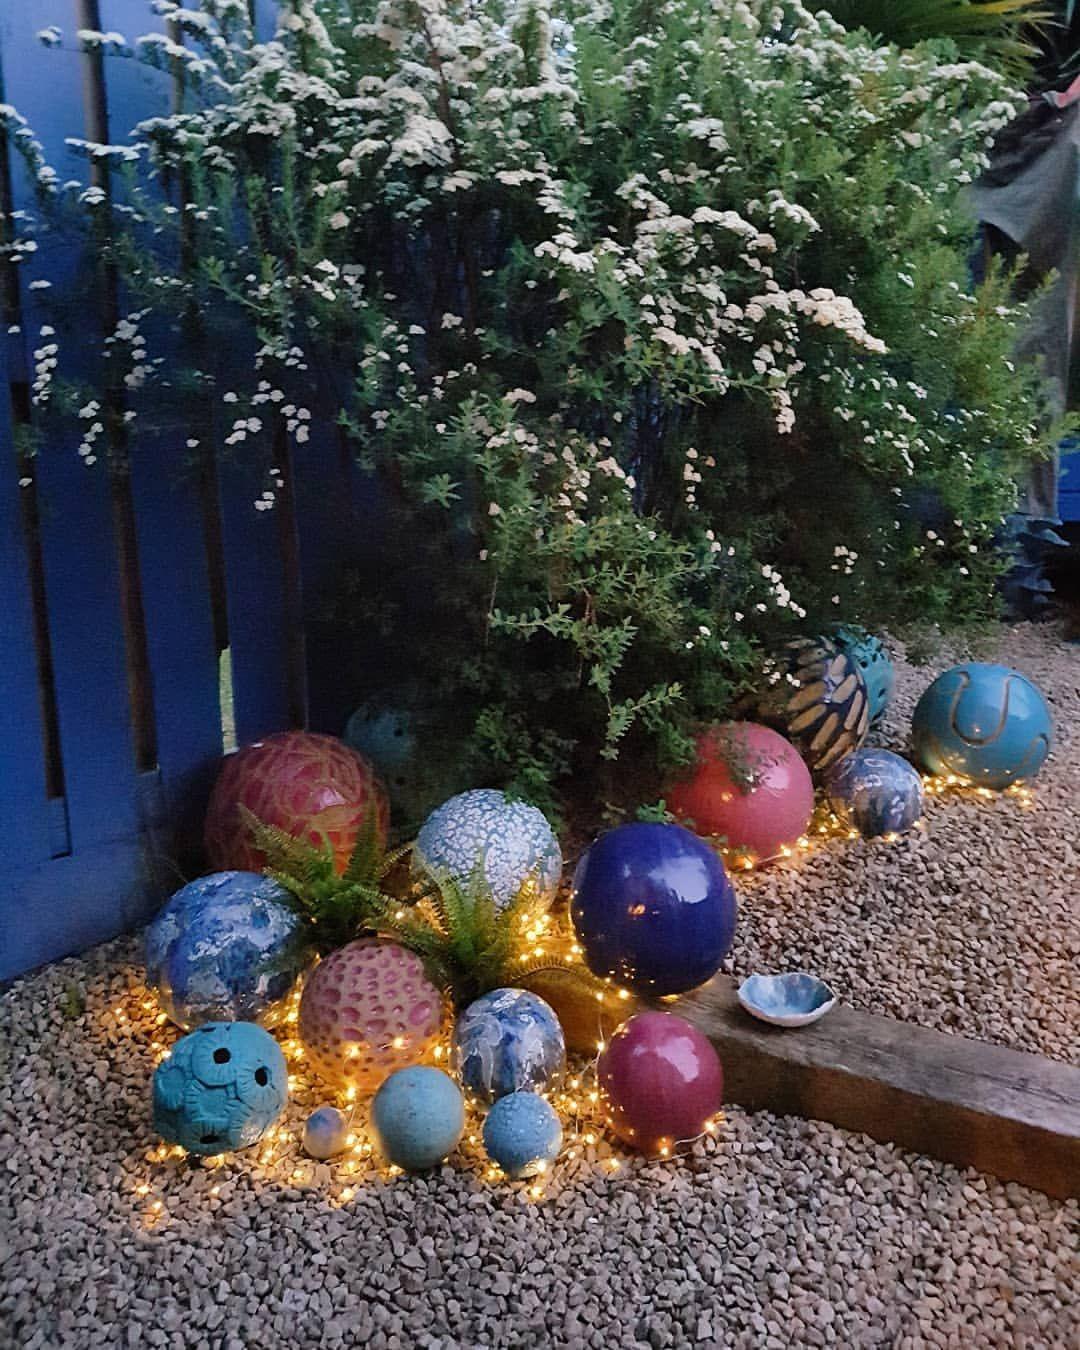 Lovin These Garden Wire Lights From Aldi Aldi Ireland They Re Solar Led Michellemaher Ceramicforms Wire Lights Solar Led Garden Ornaments